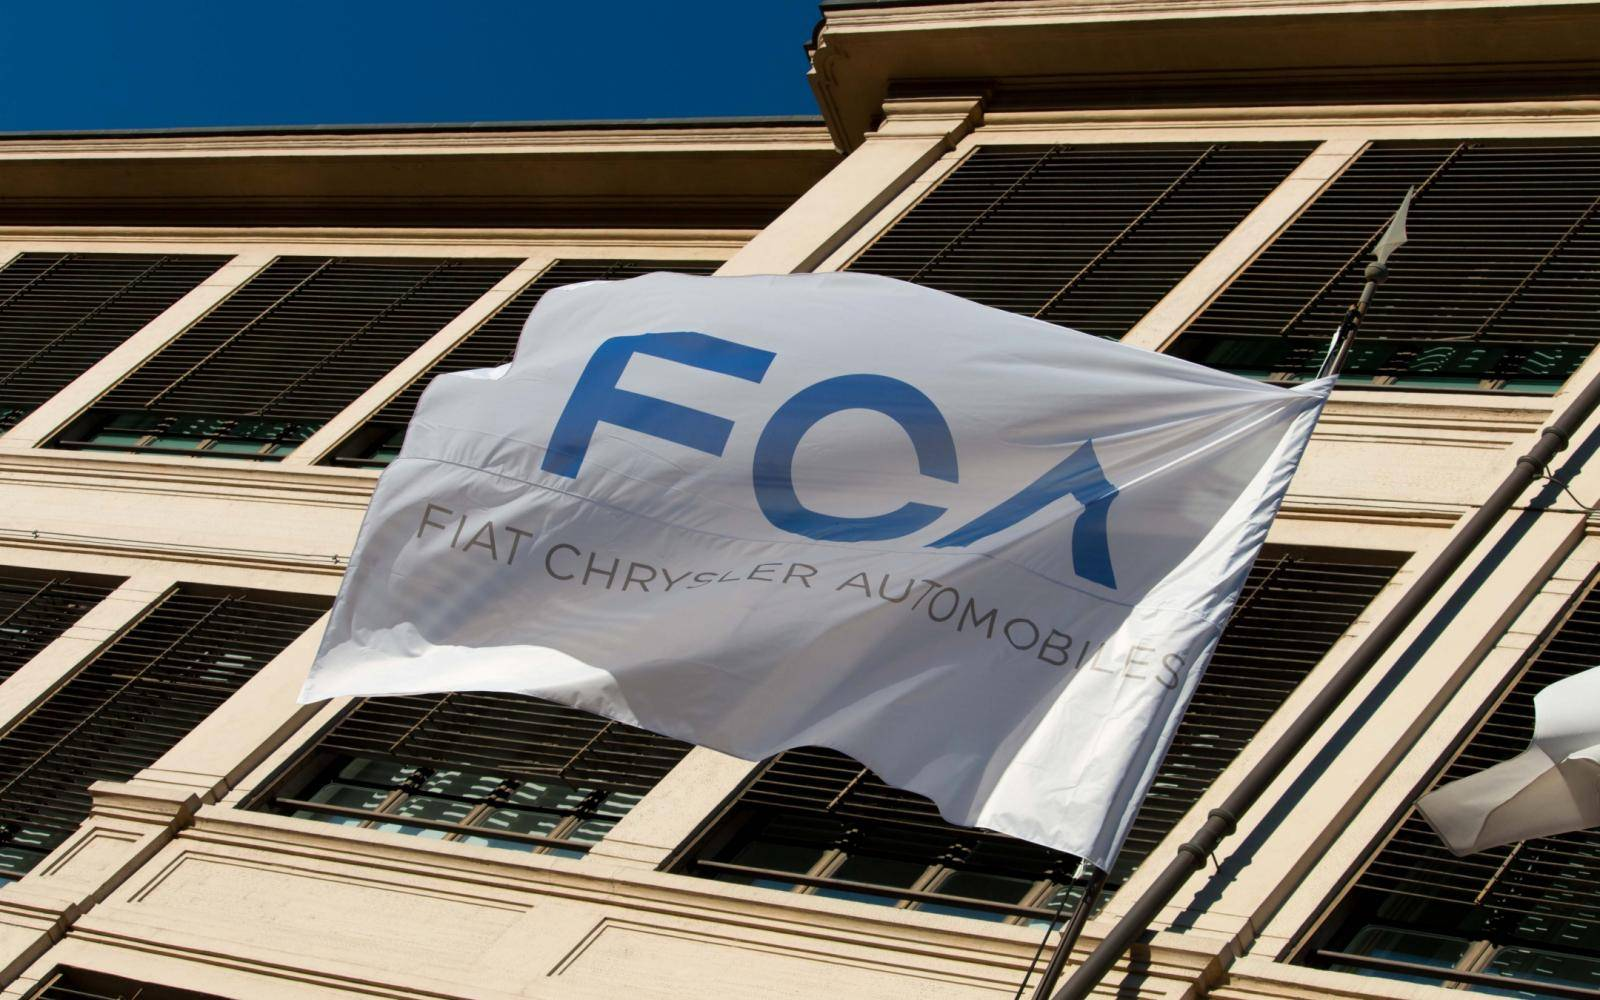 Fiat Chrysler Automobiles en PSA Group praten over fusie